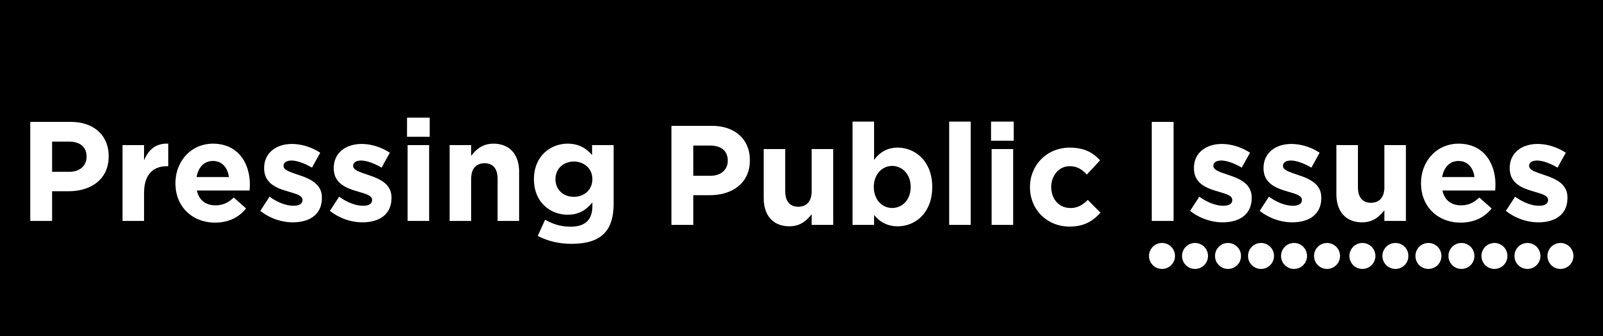 Pressing Public Issues